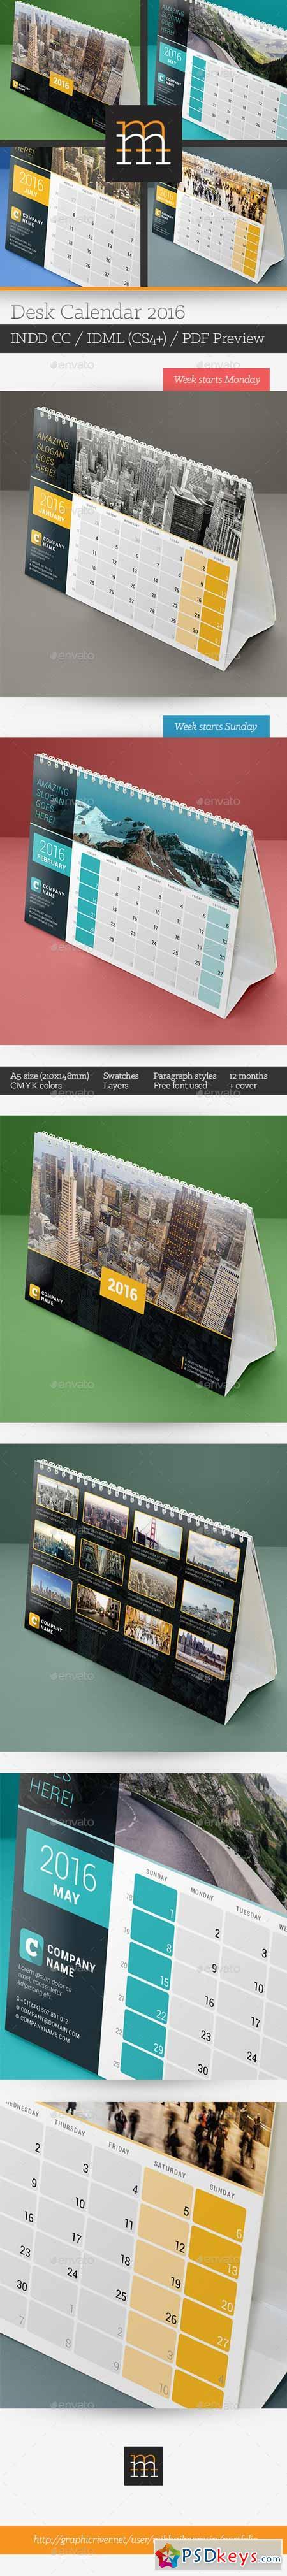 desk calendar 2016 13234450 free download photoshop vector stock